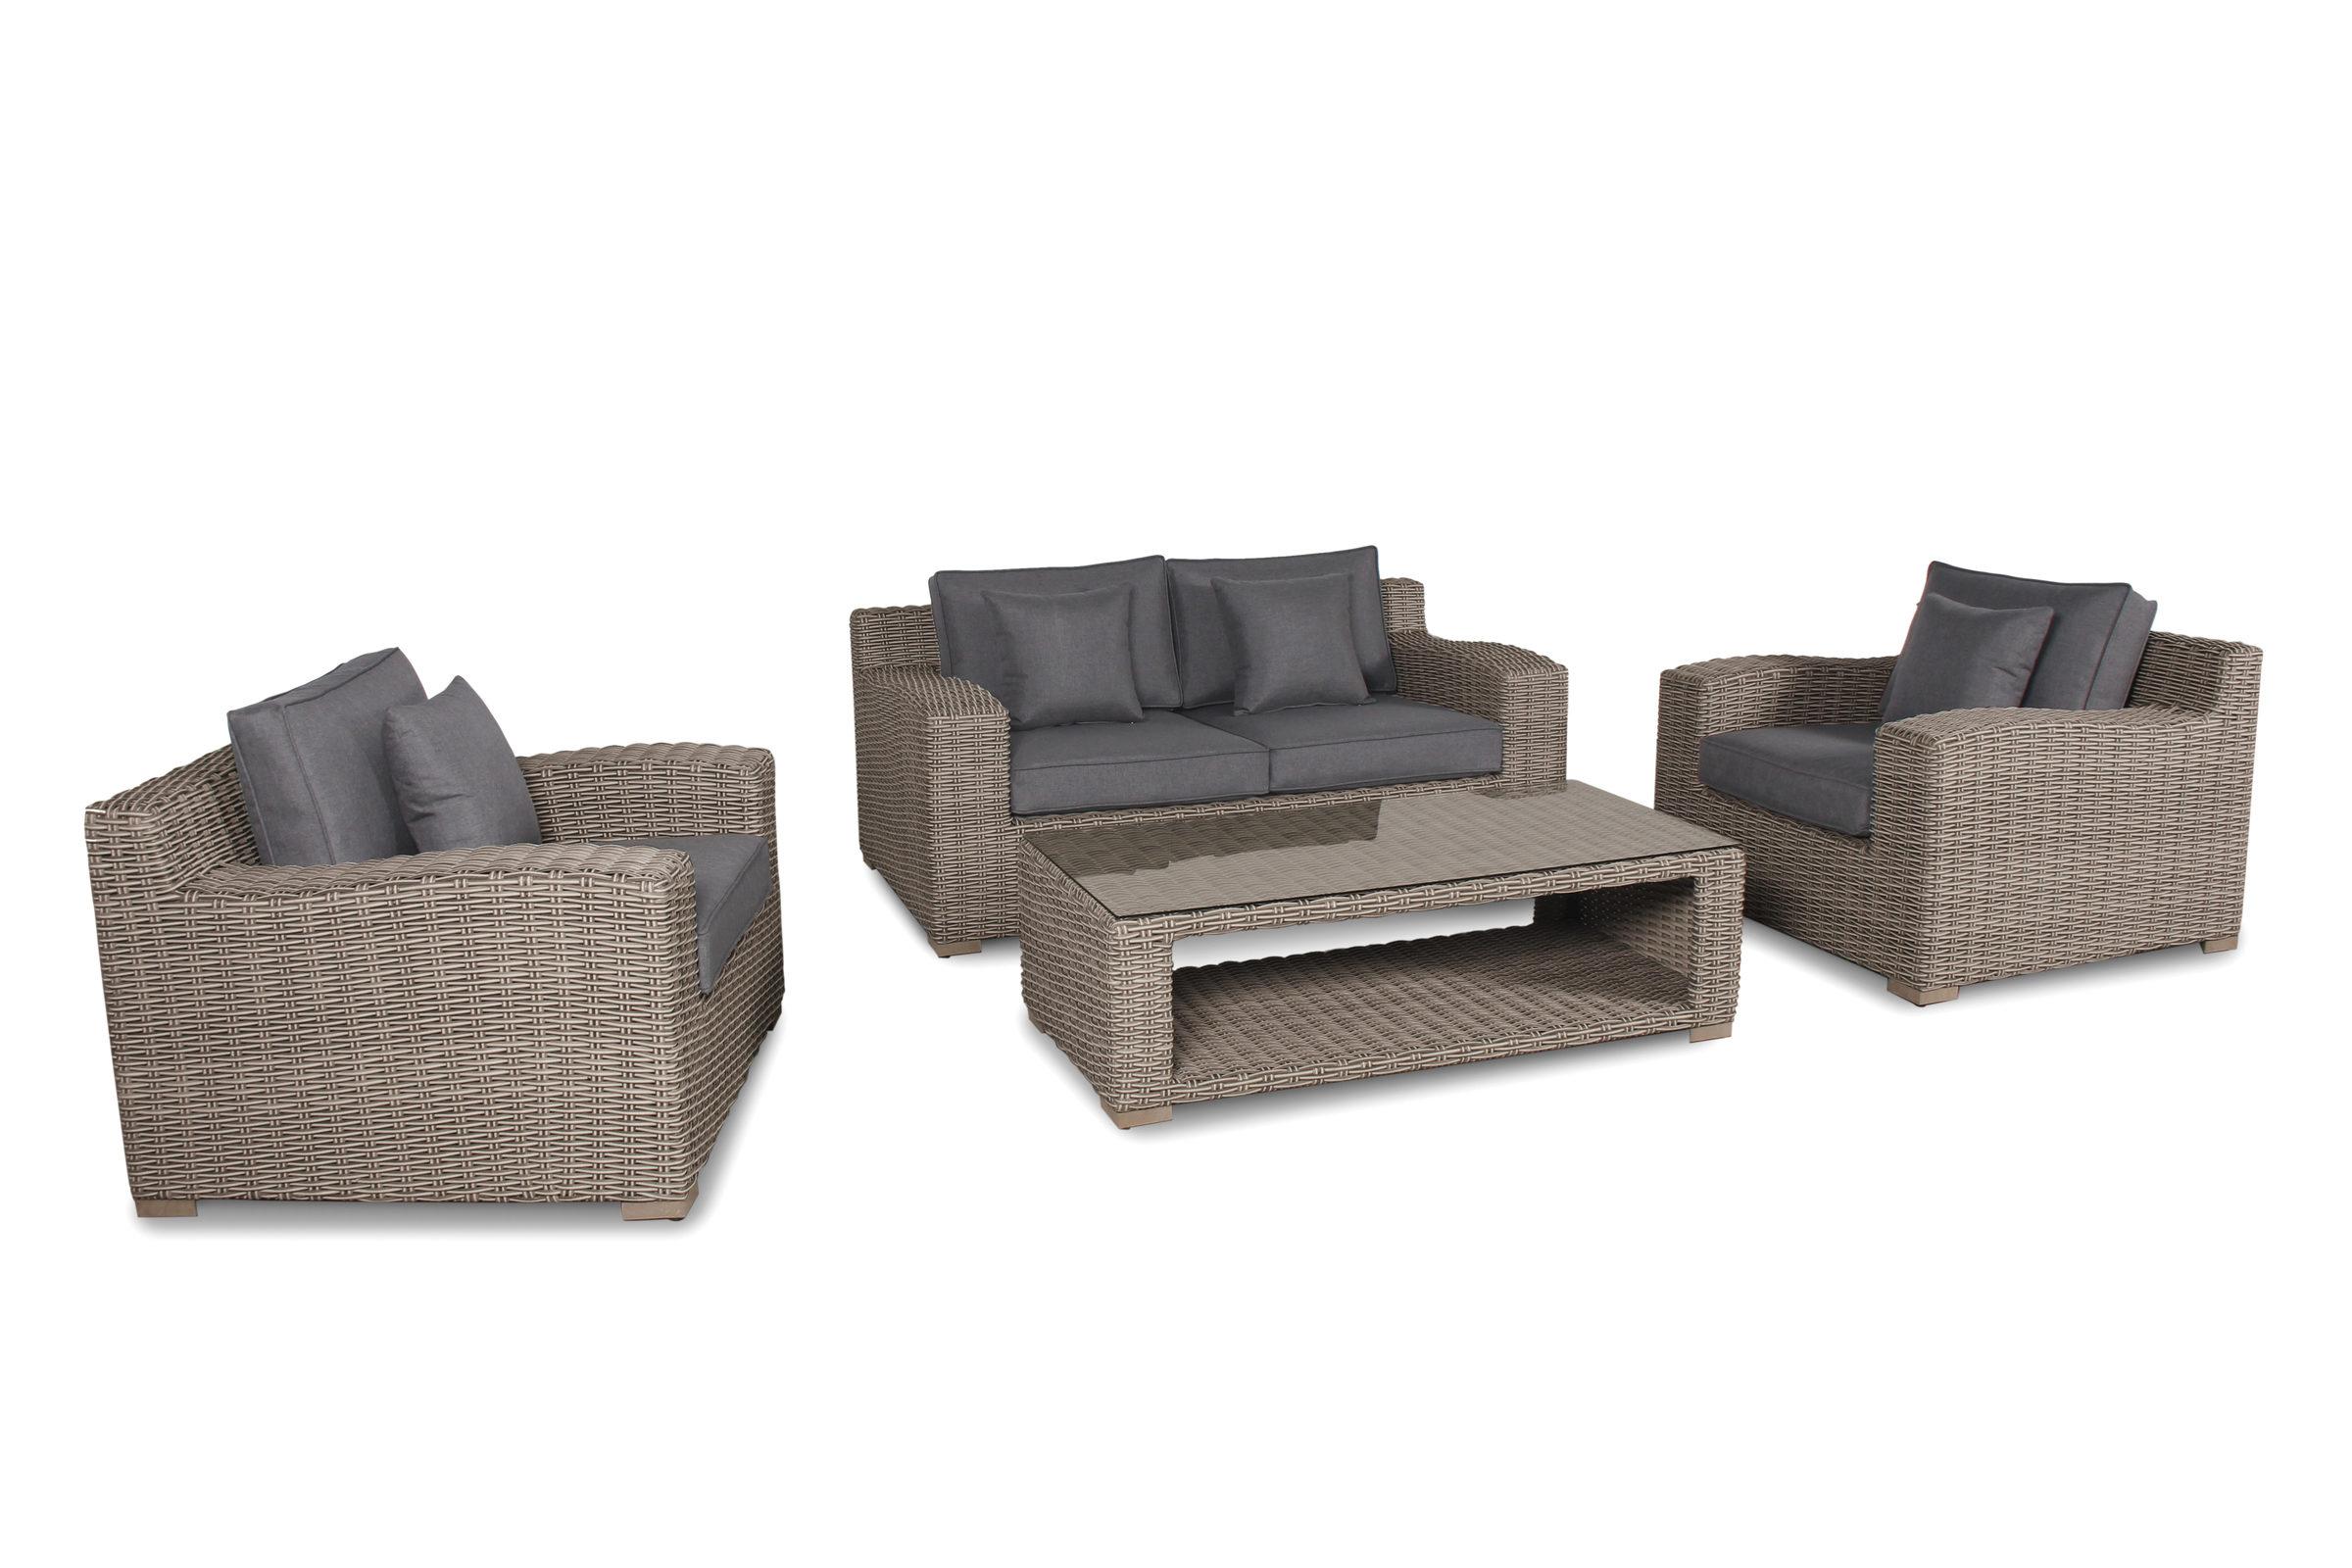 Kettler Palma Luxe 2 Seat Set